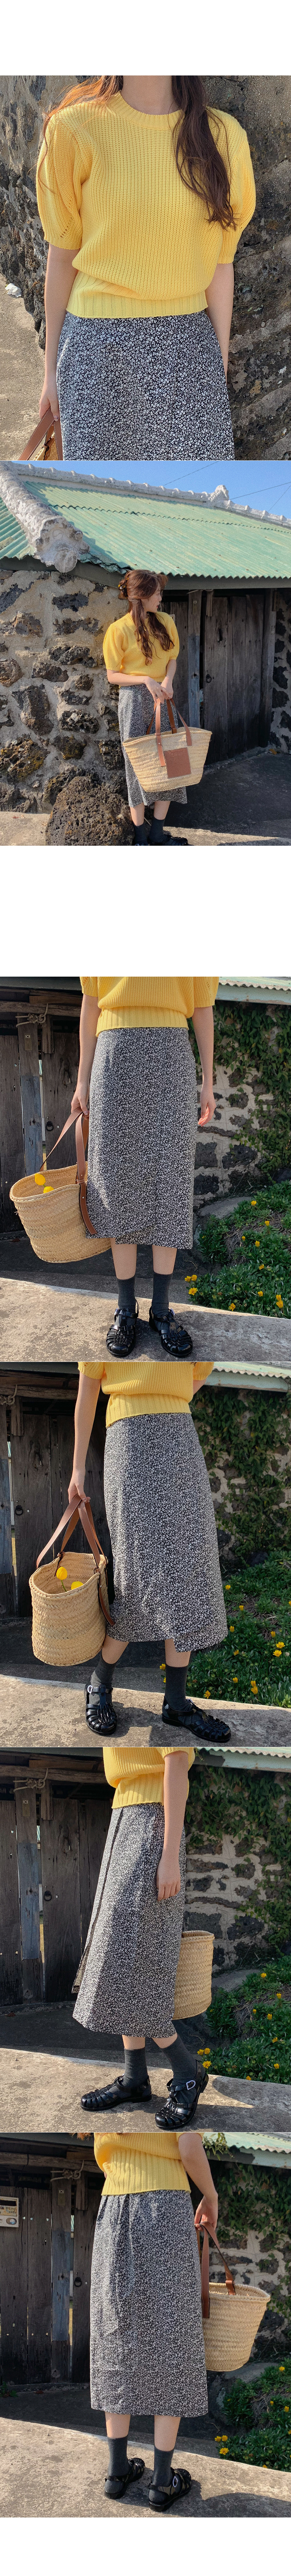 Basic Short Sleeve Knitwear